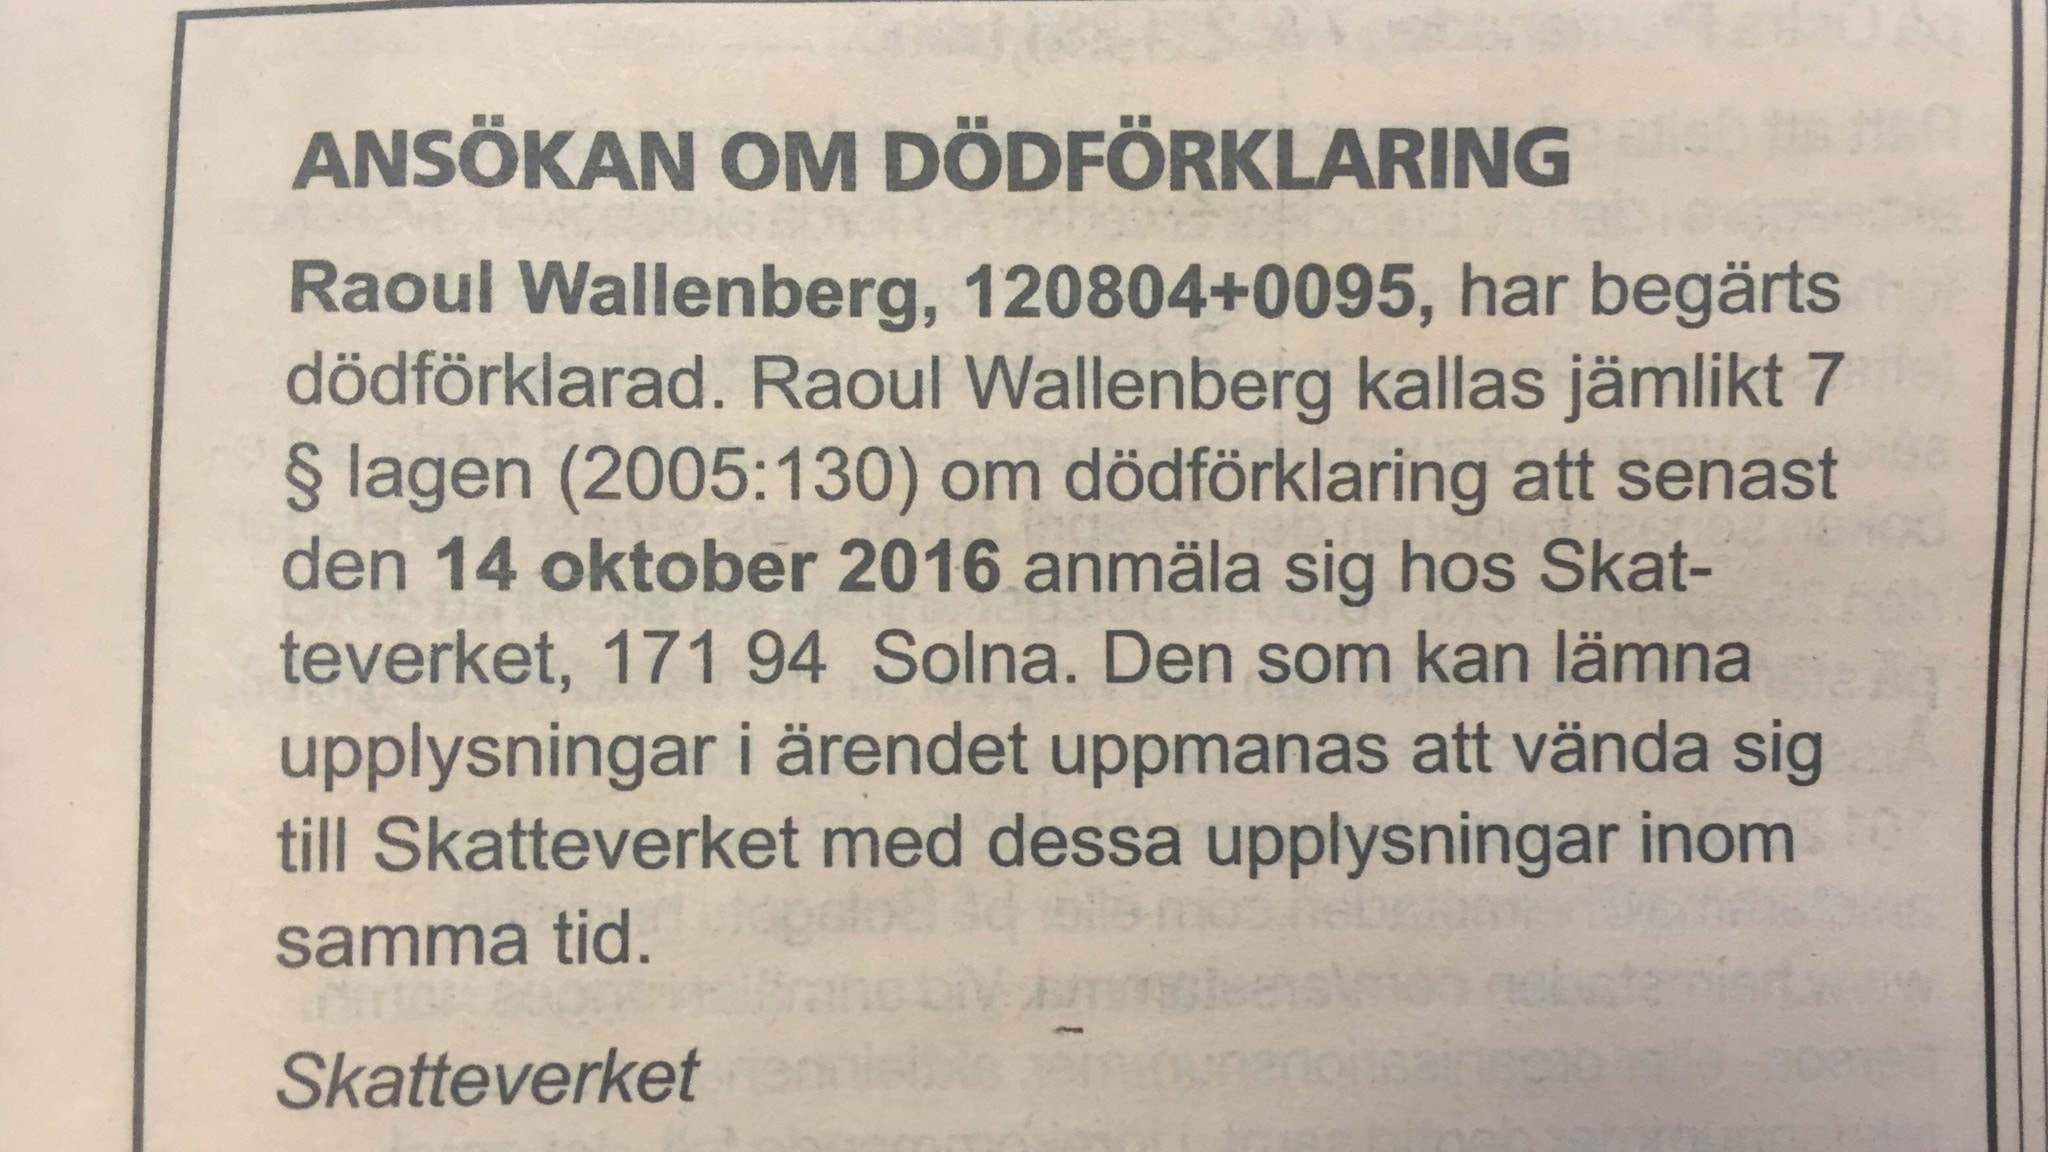 Raoul wallenberg begars dodforklarad